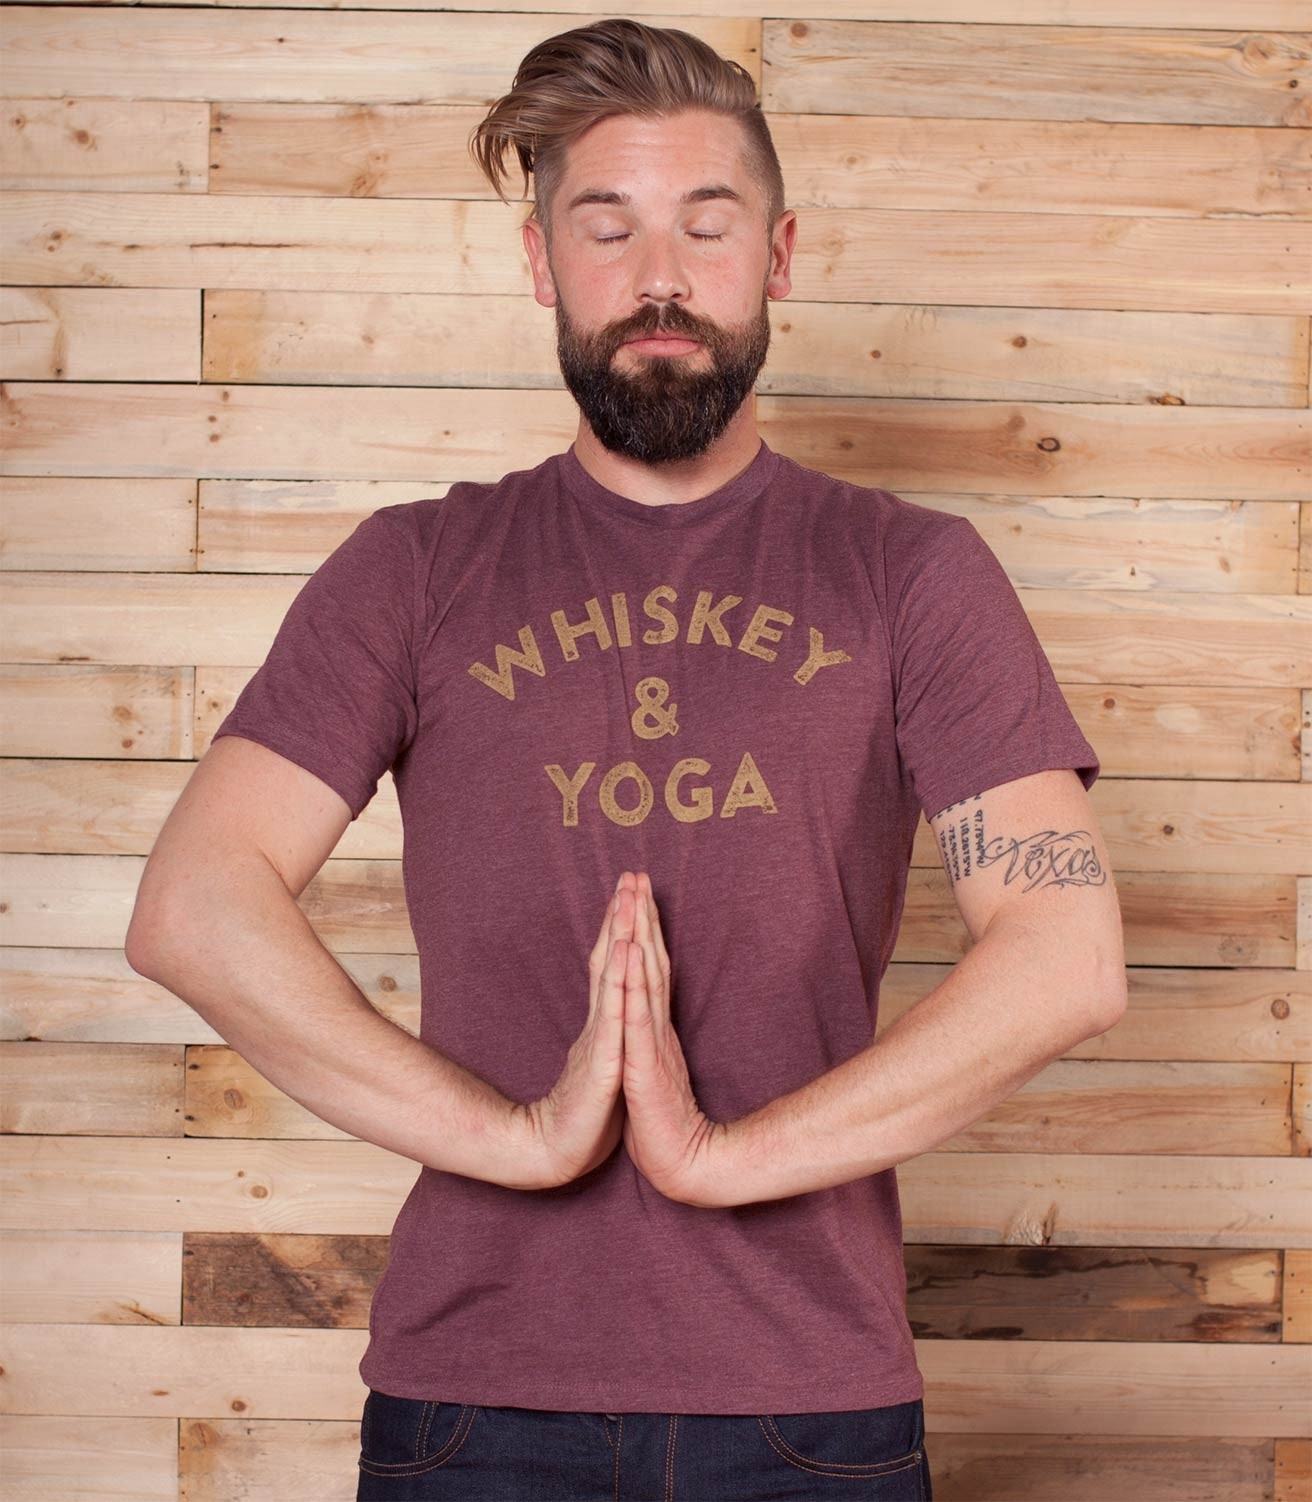 031c9201a Whiskey & Yoga Men's Funny Drinking T-Shirt | Headline Shirts